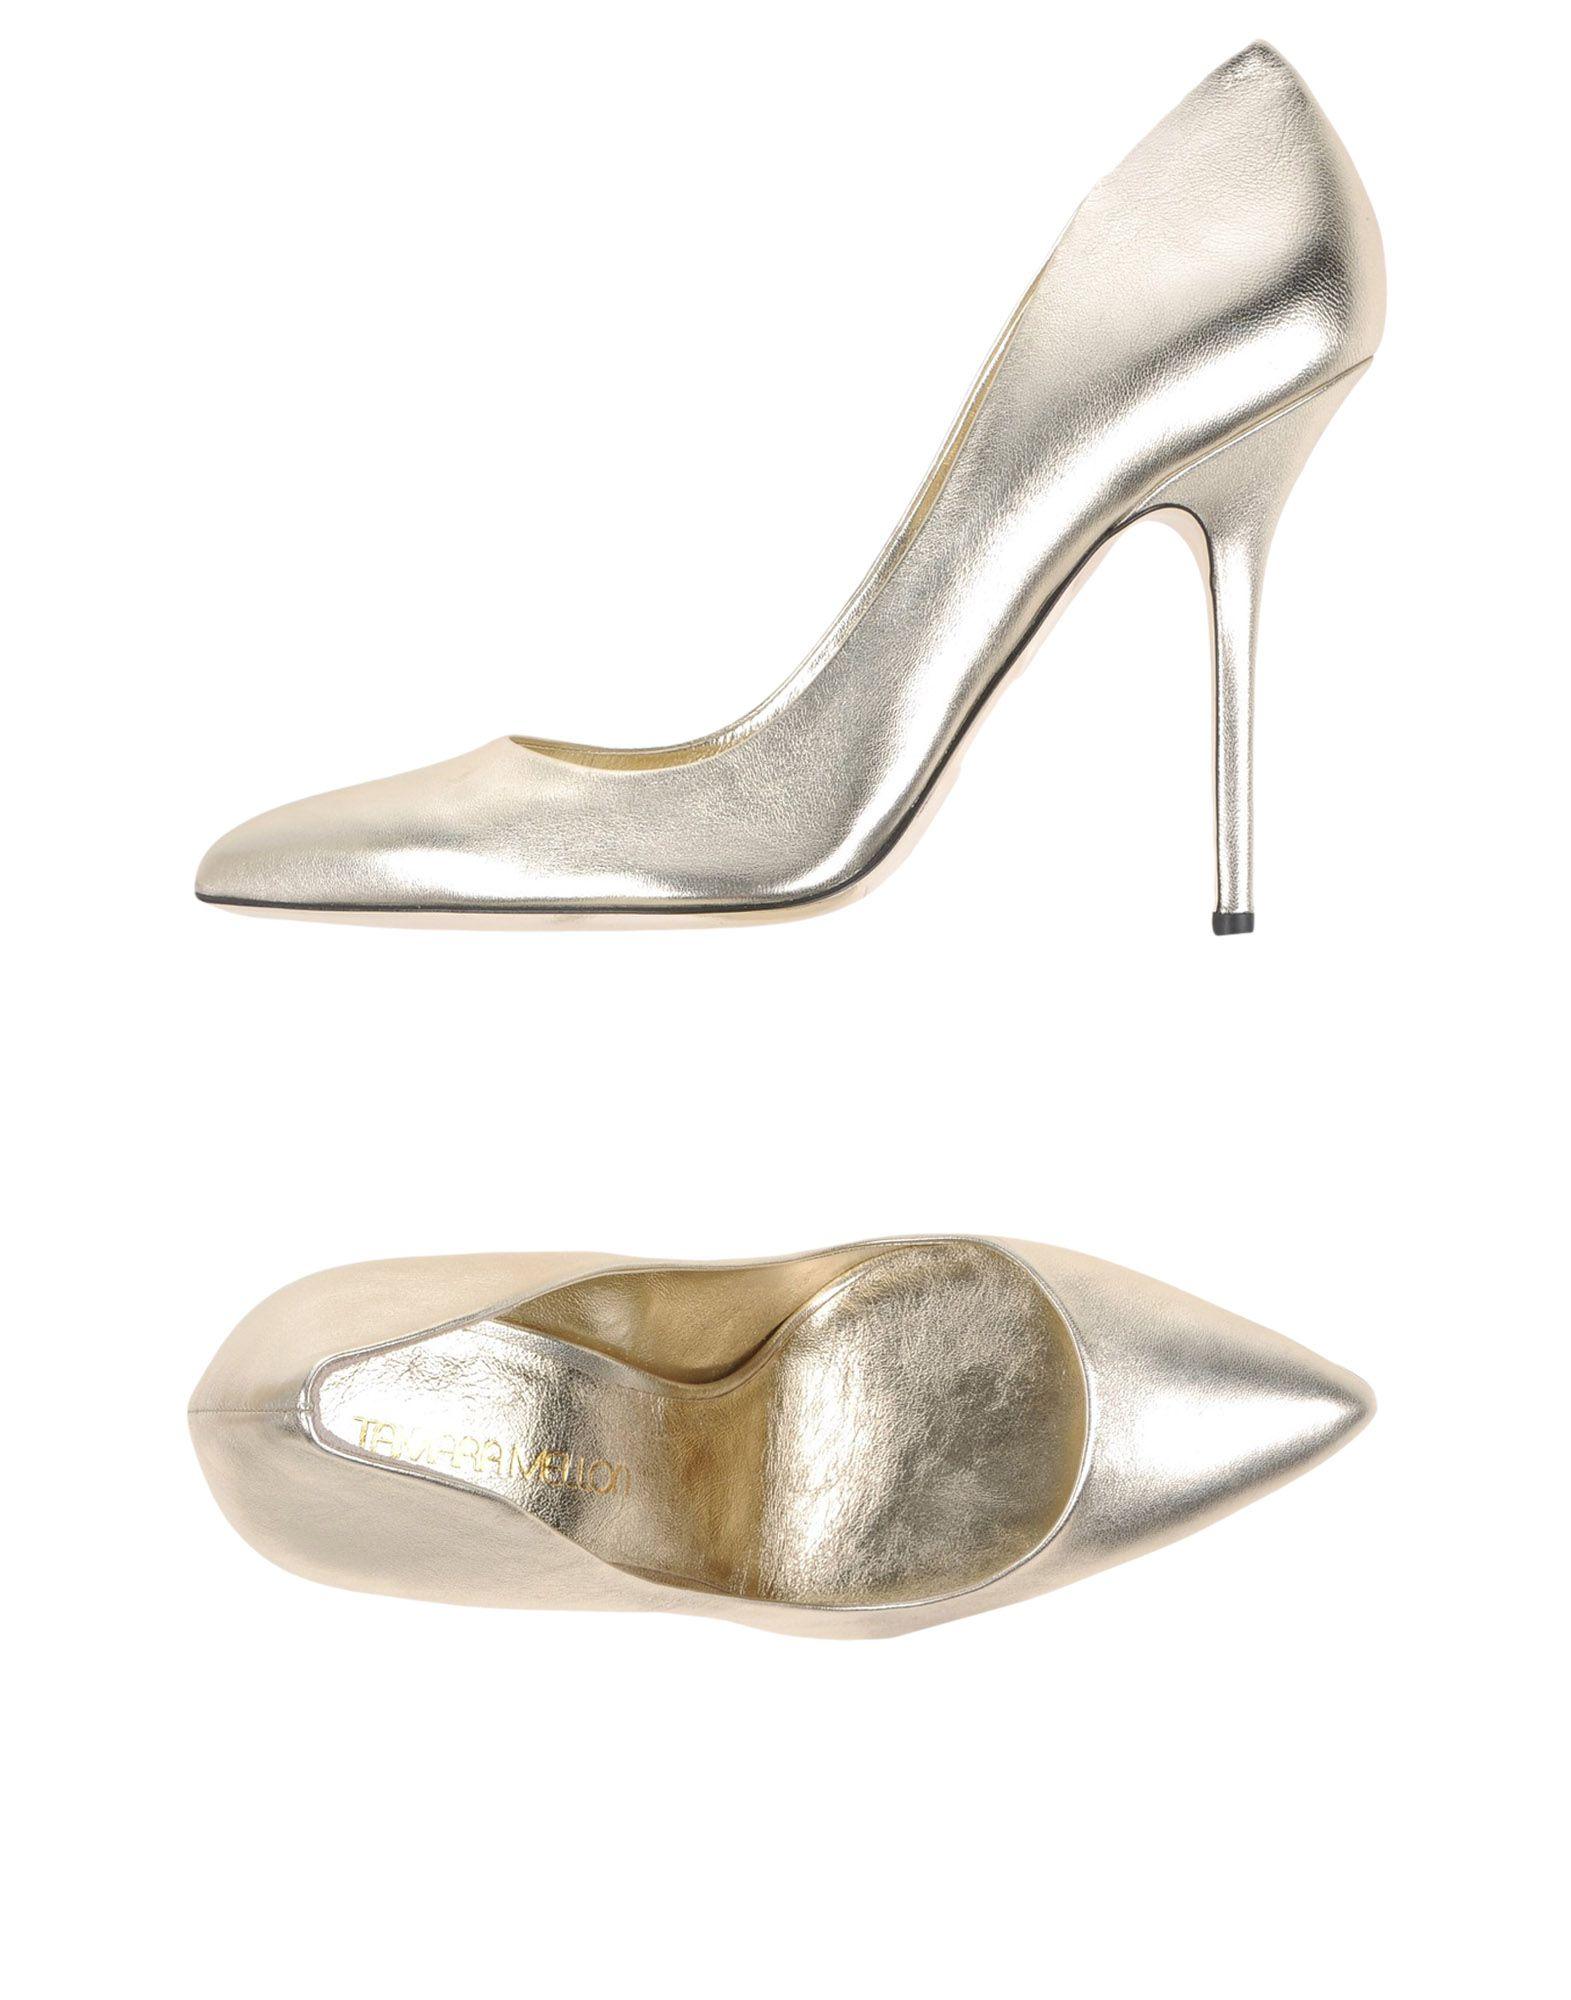 TAMARA MELLON Туфли цены онлайн